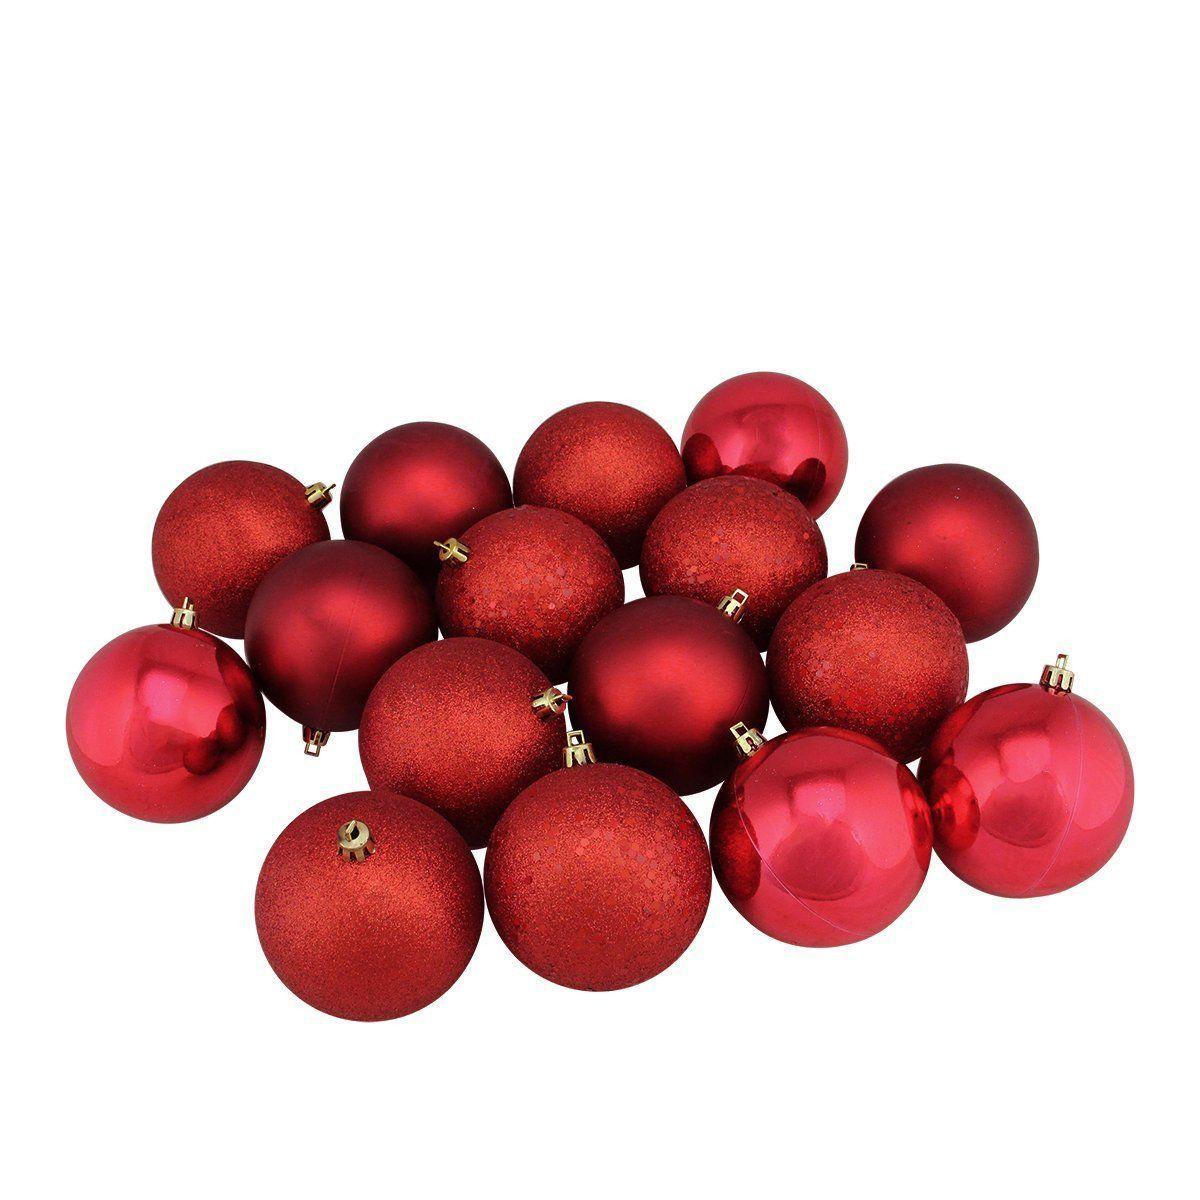 Yyaaloa 24pcs Exquisite Balls Ornaments 1 57 For Christmas Tree Decor Decoration Ball Best Christmas Tree Decorations Ball Ornaments Christmas Tree Decorations